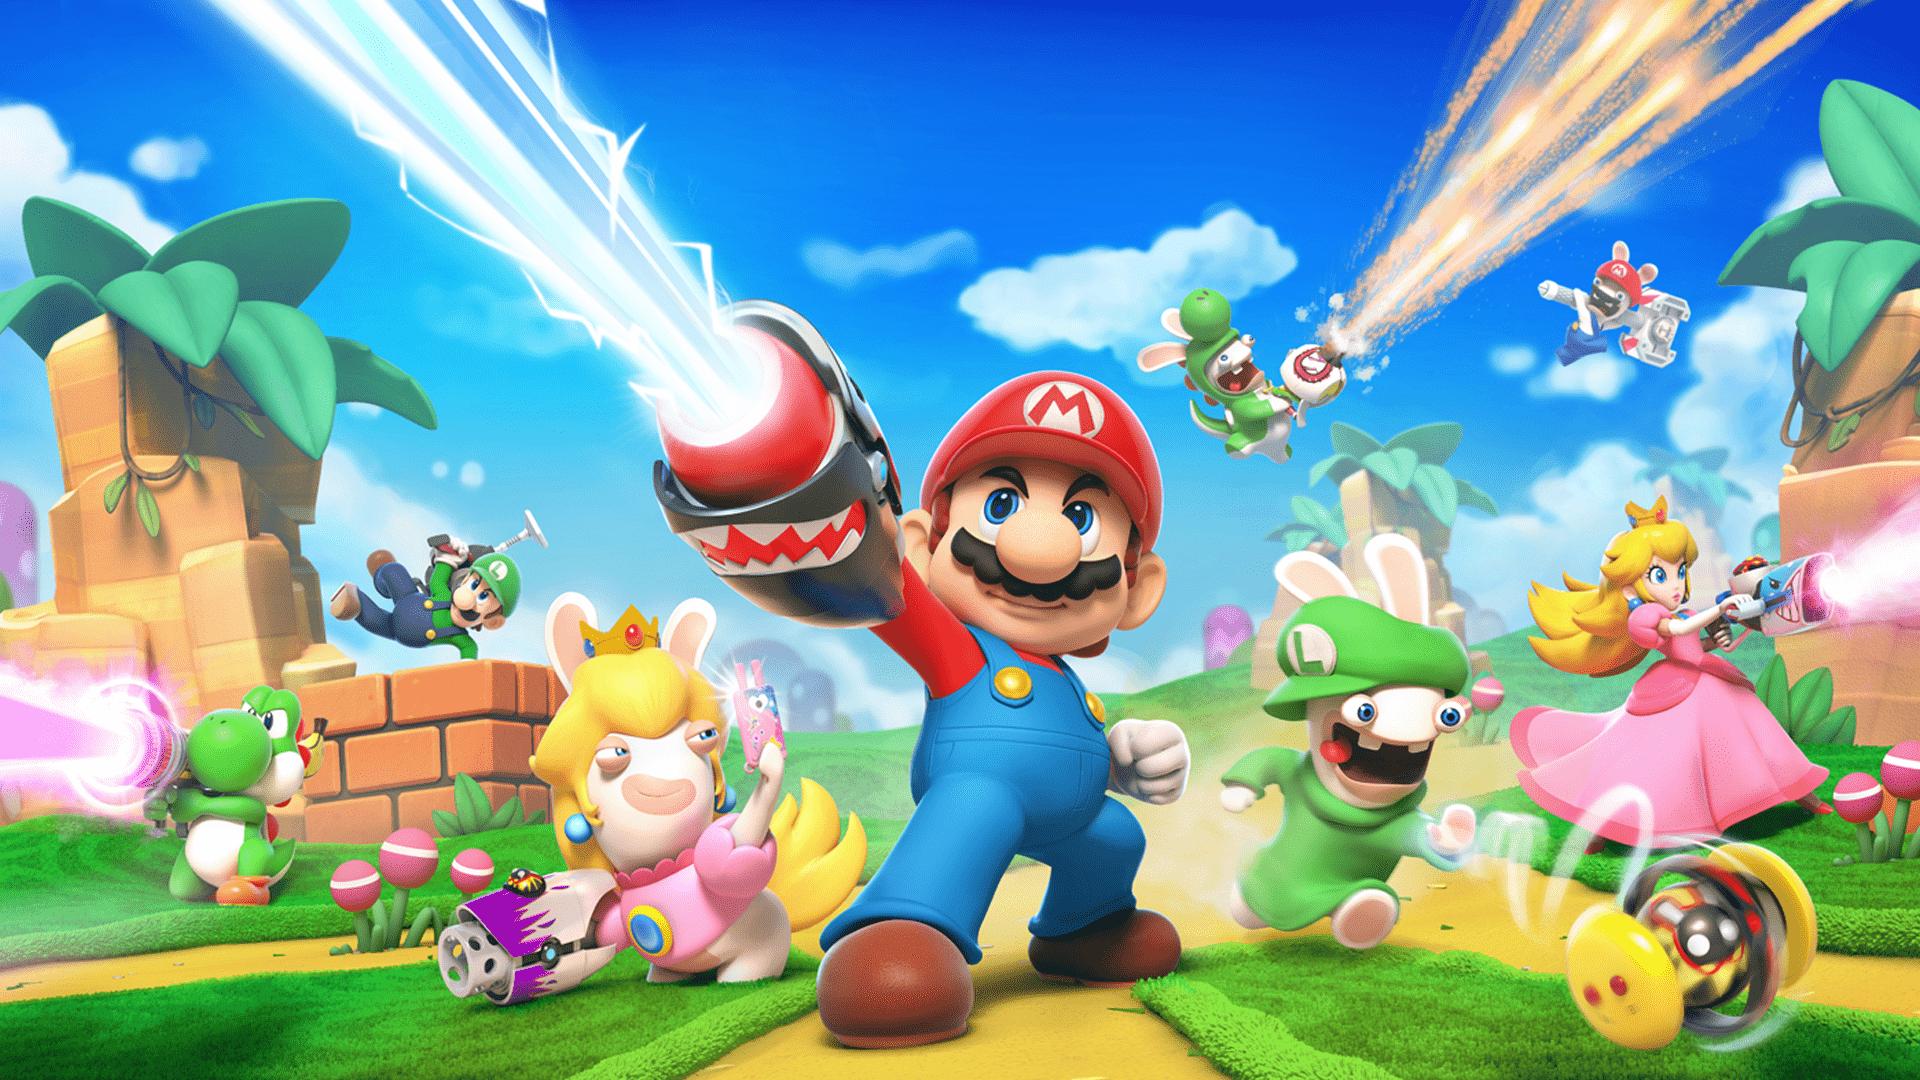 Слух: На Ubisoft Forward состоится анонс Mario + Rabbids: Kingdom Battle 2 2